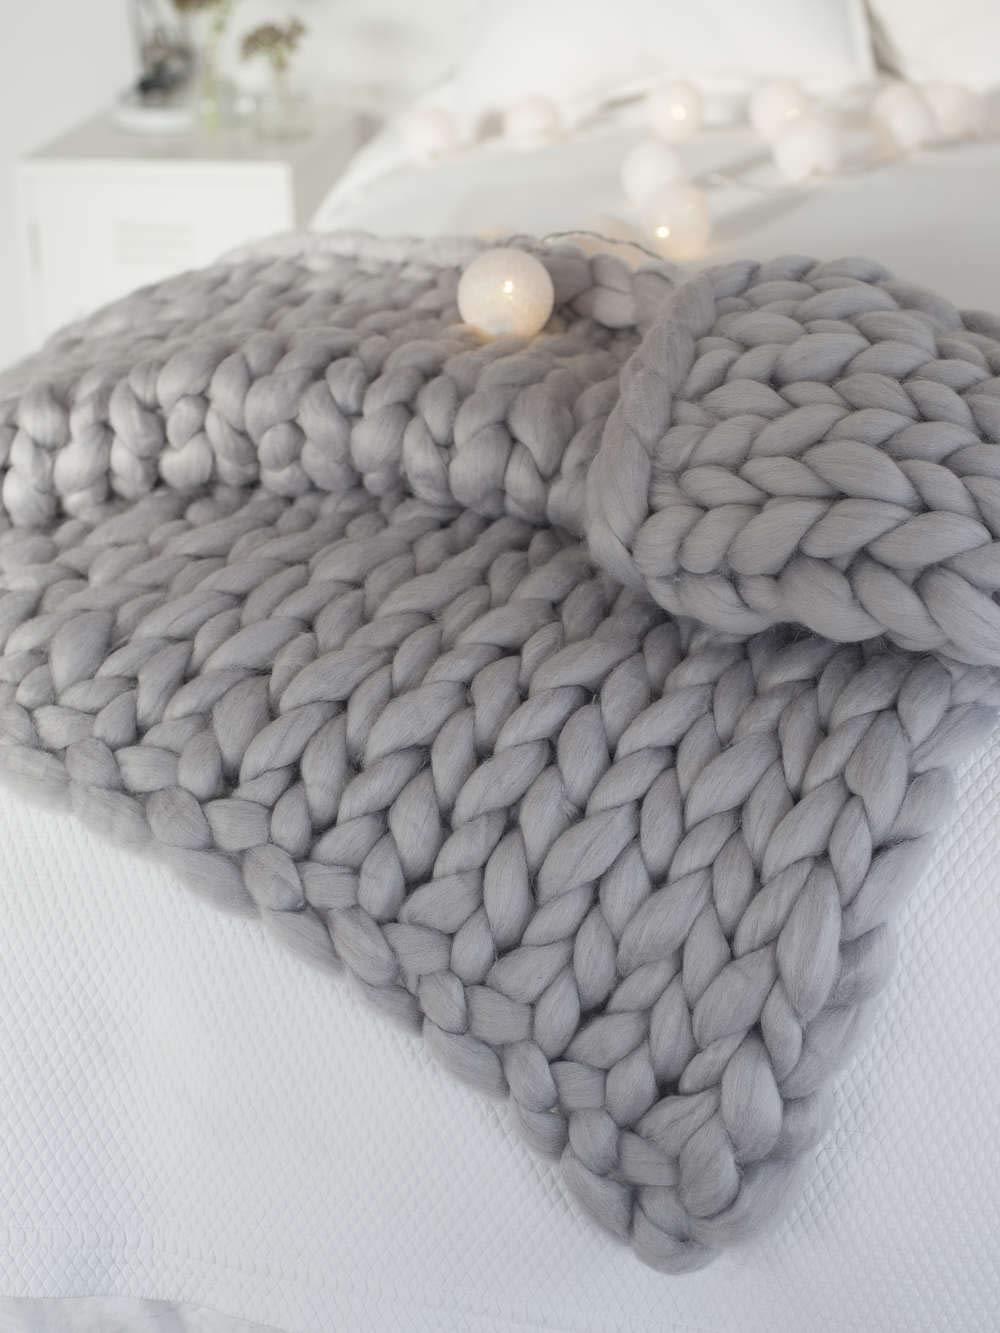 "clootess Chunky Knit Blanket Merino Wool Hand Made Throw Boho Bedroom Home Decor Giant Yarn (Light Gray 40""x40"")"